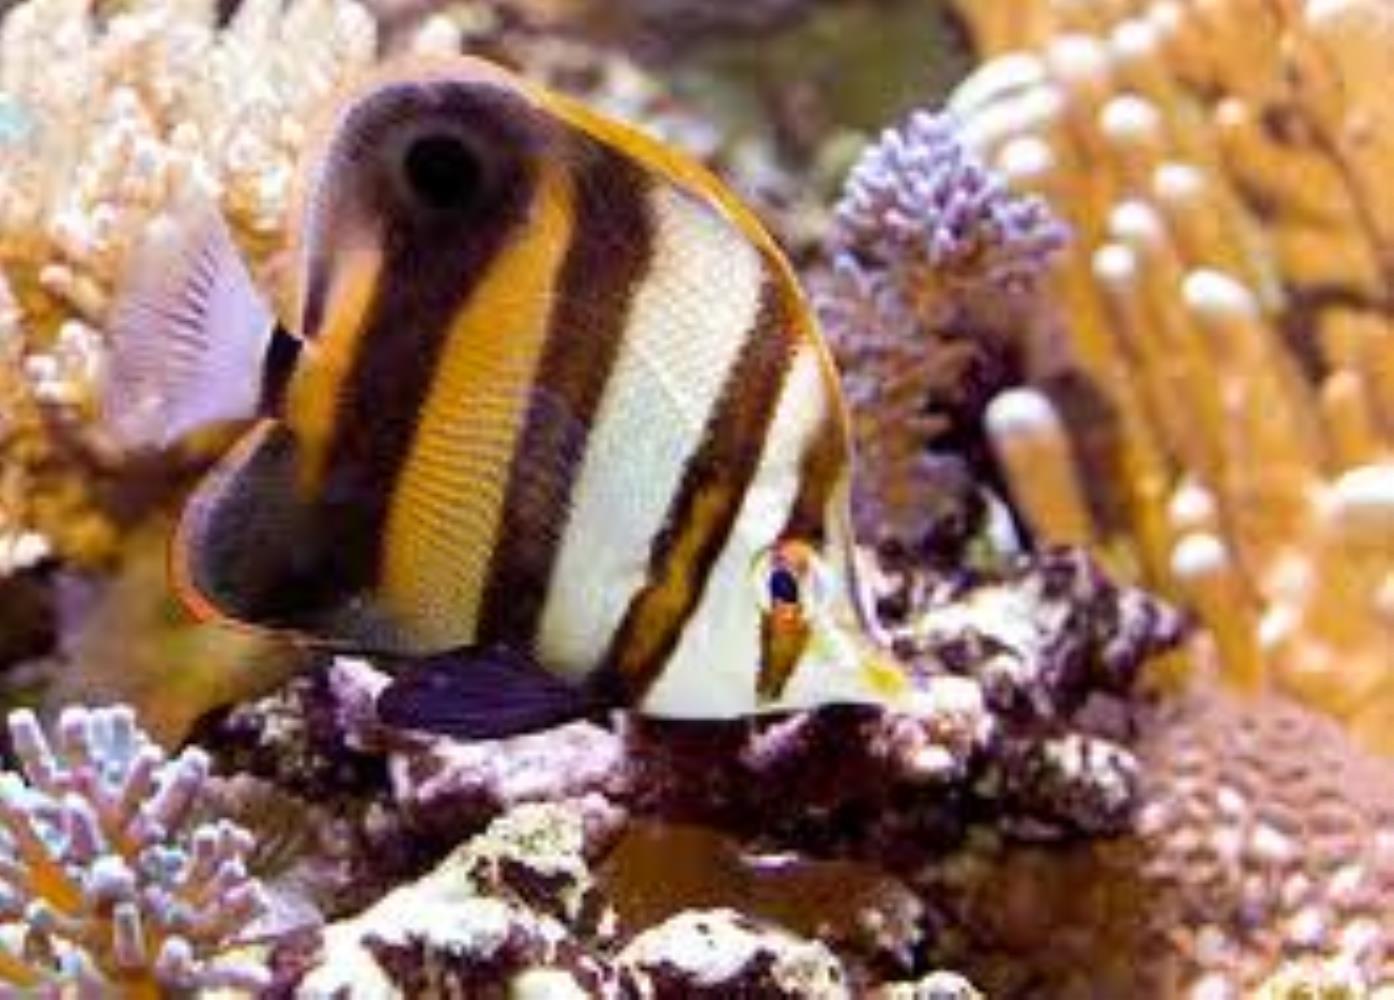 Blackfin Coralfish